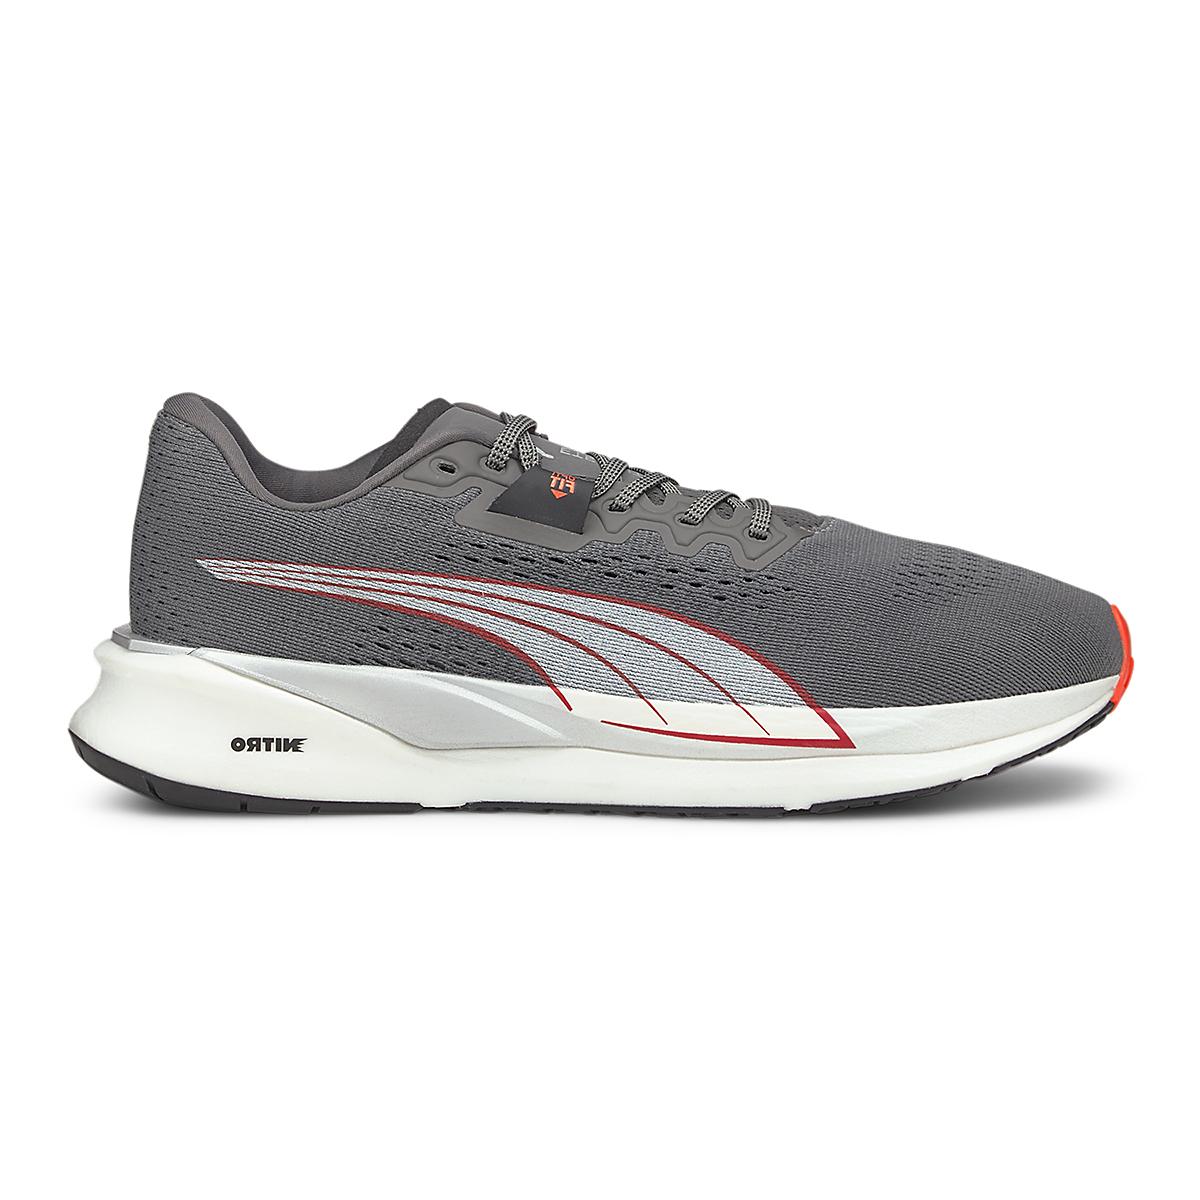 Men's Puma Eternity Nitro Running Shoe - Color: Castlerock / Puma White / Lava Blast - Size: 7 - Width: Regular, Castlerock / Puma White / Lava Blast, large, image 1